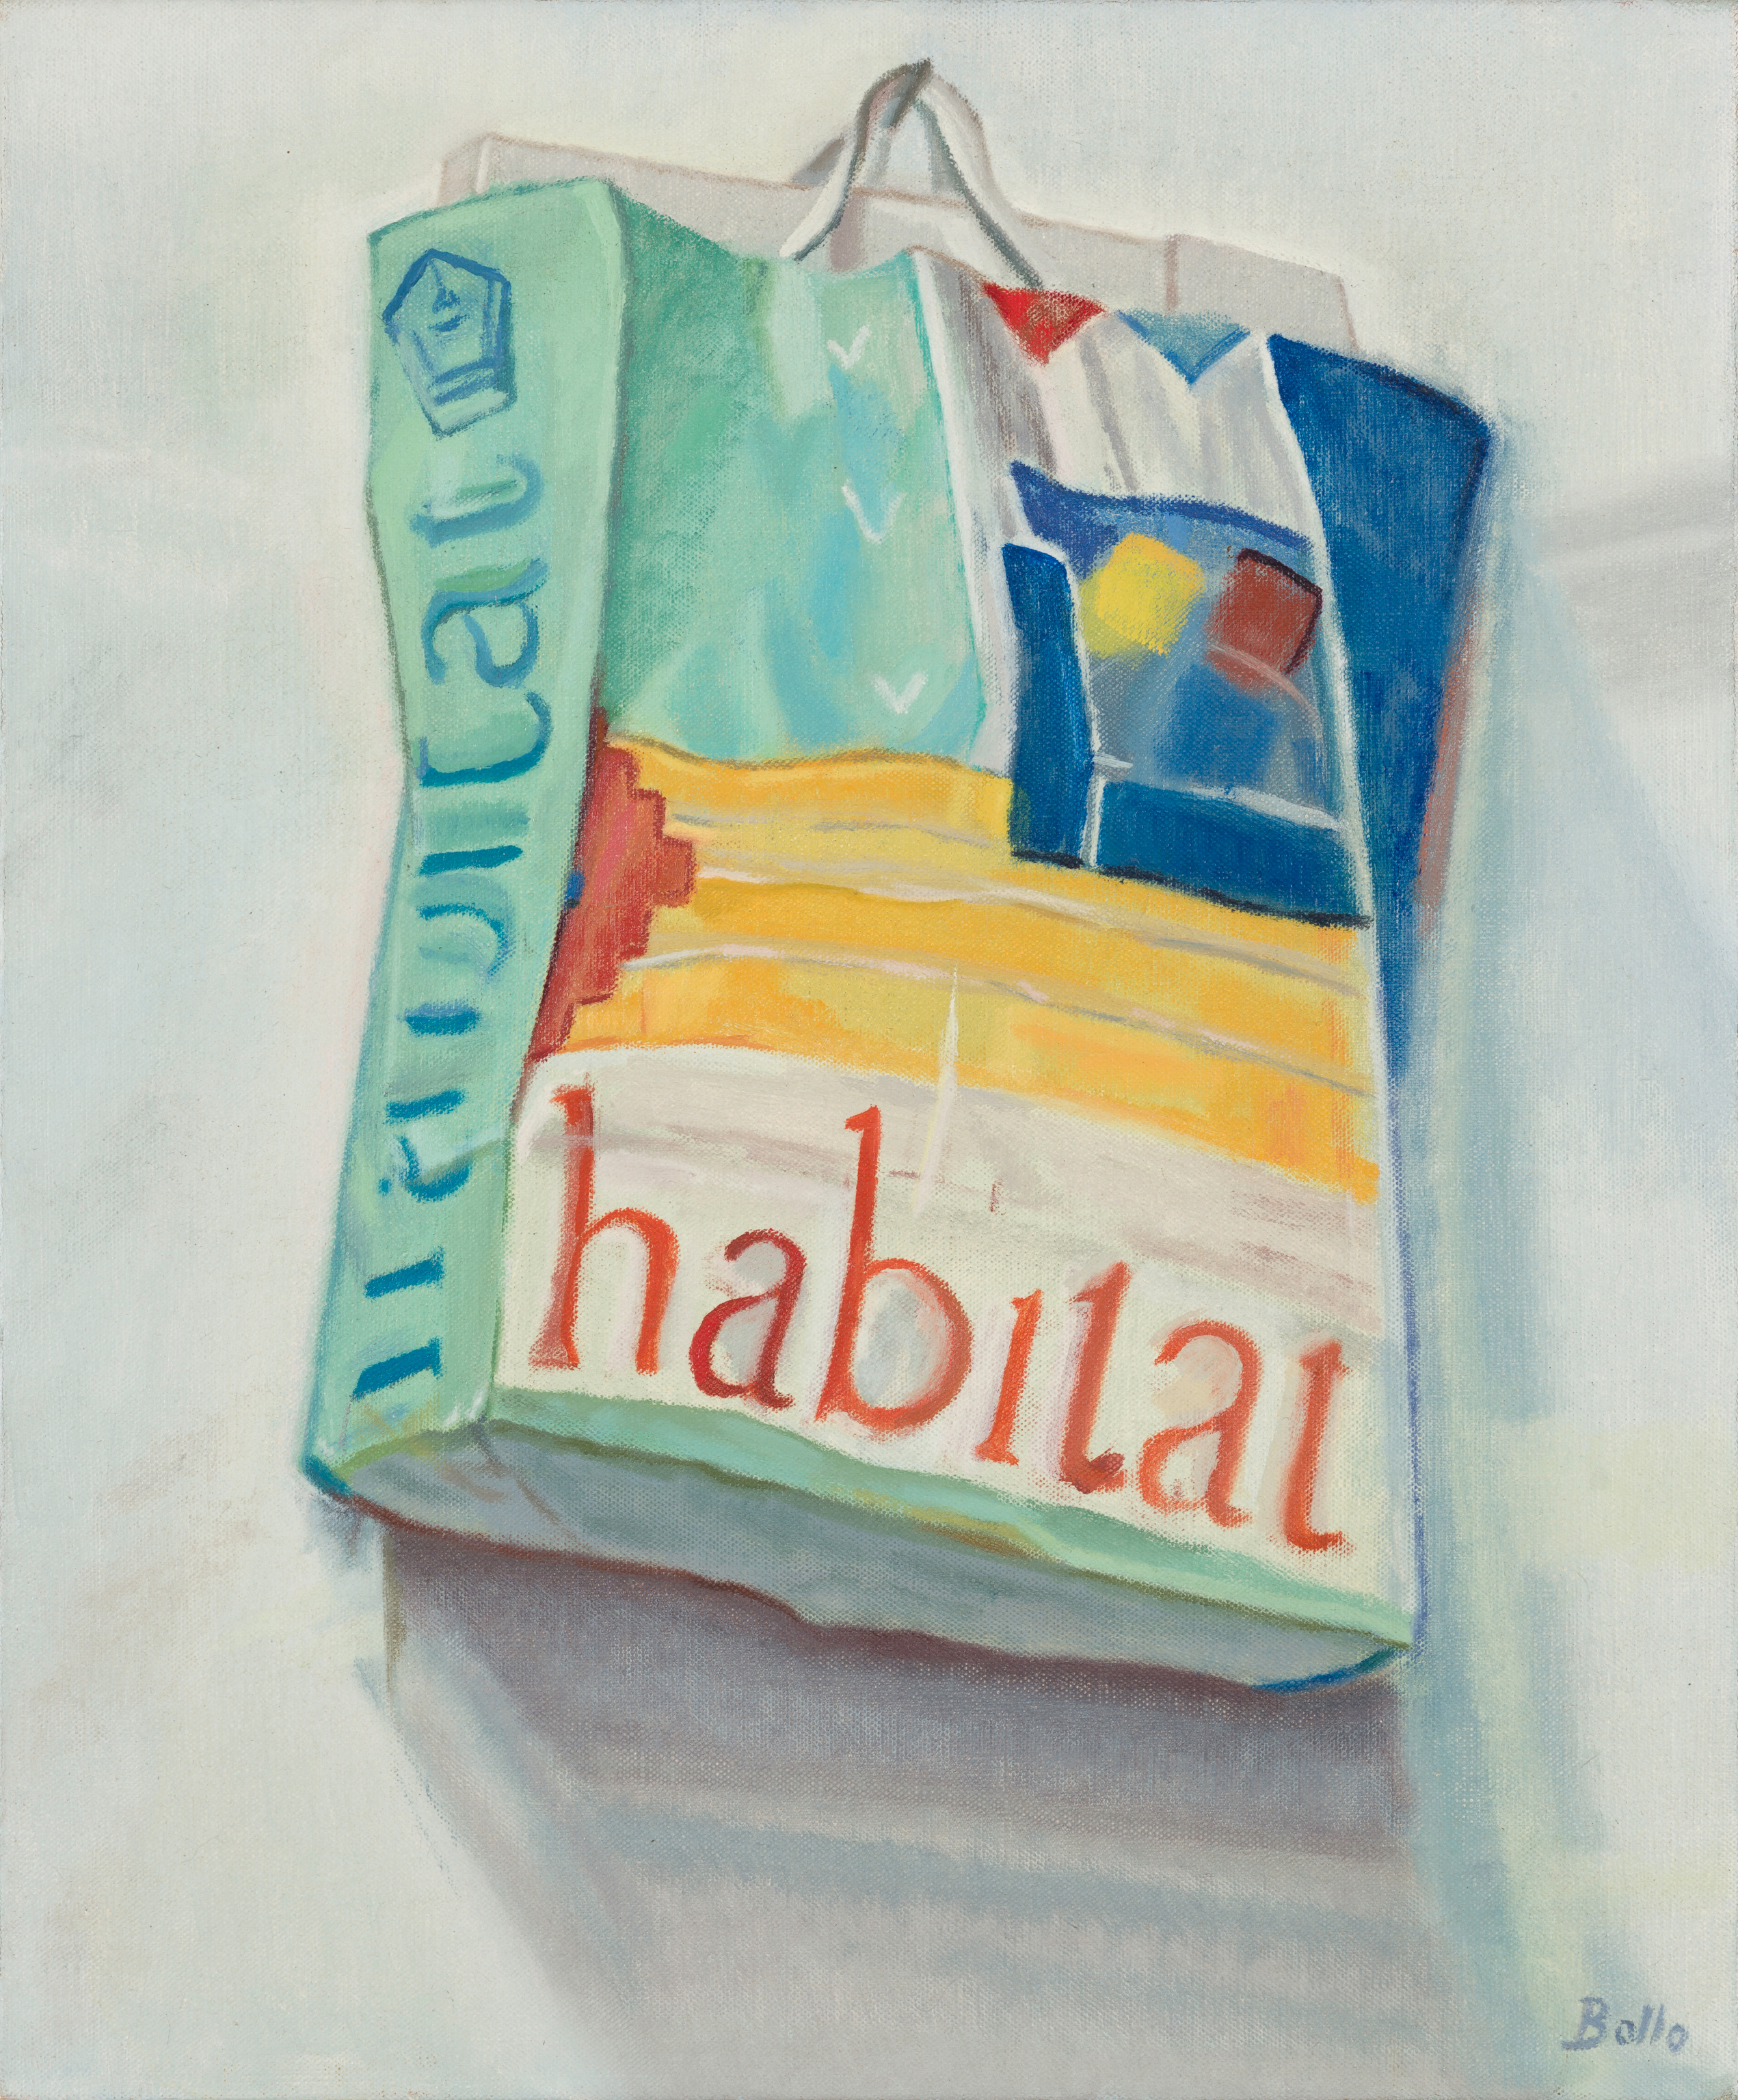 Sac Habitat